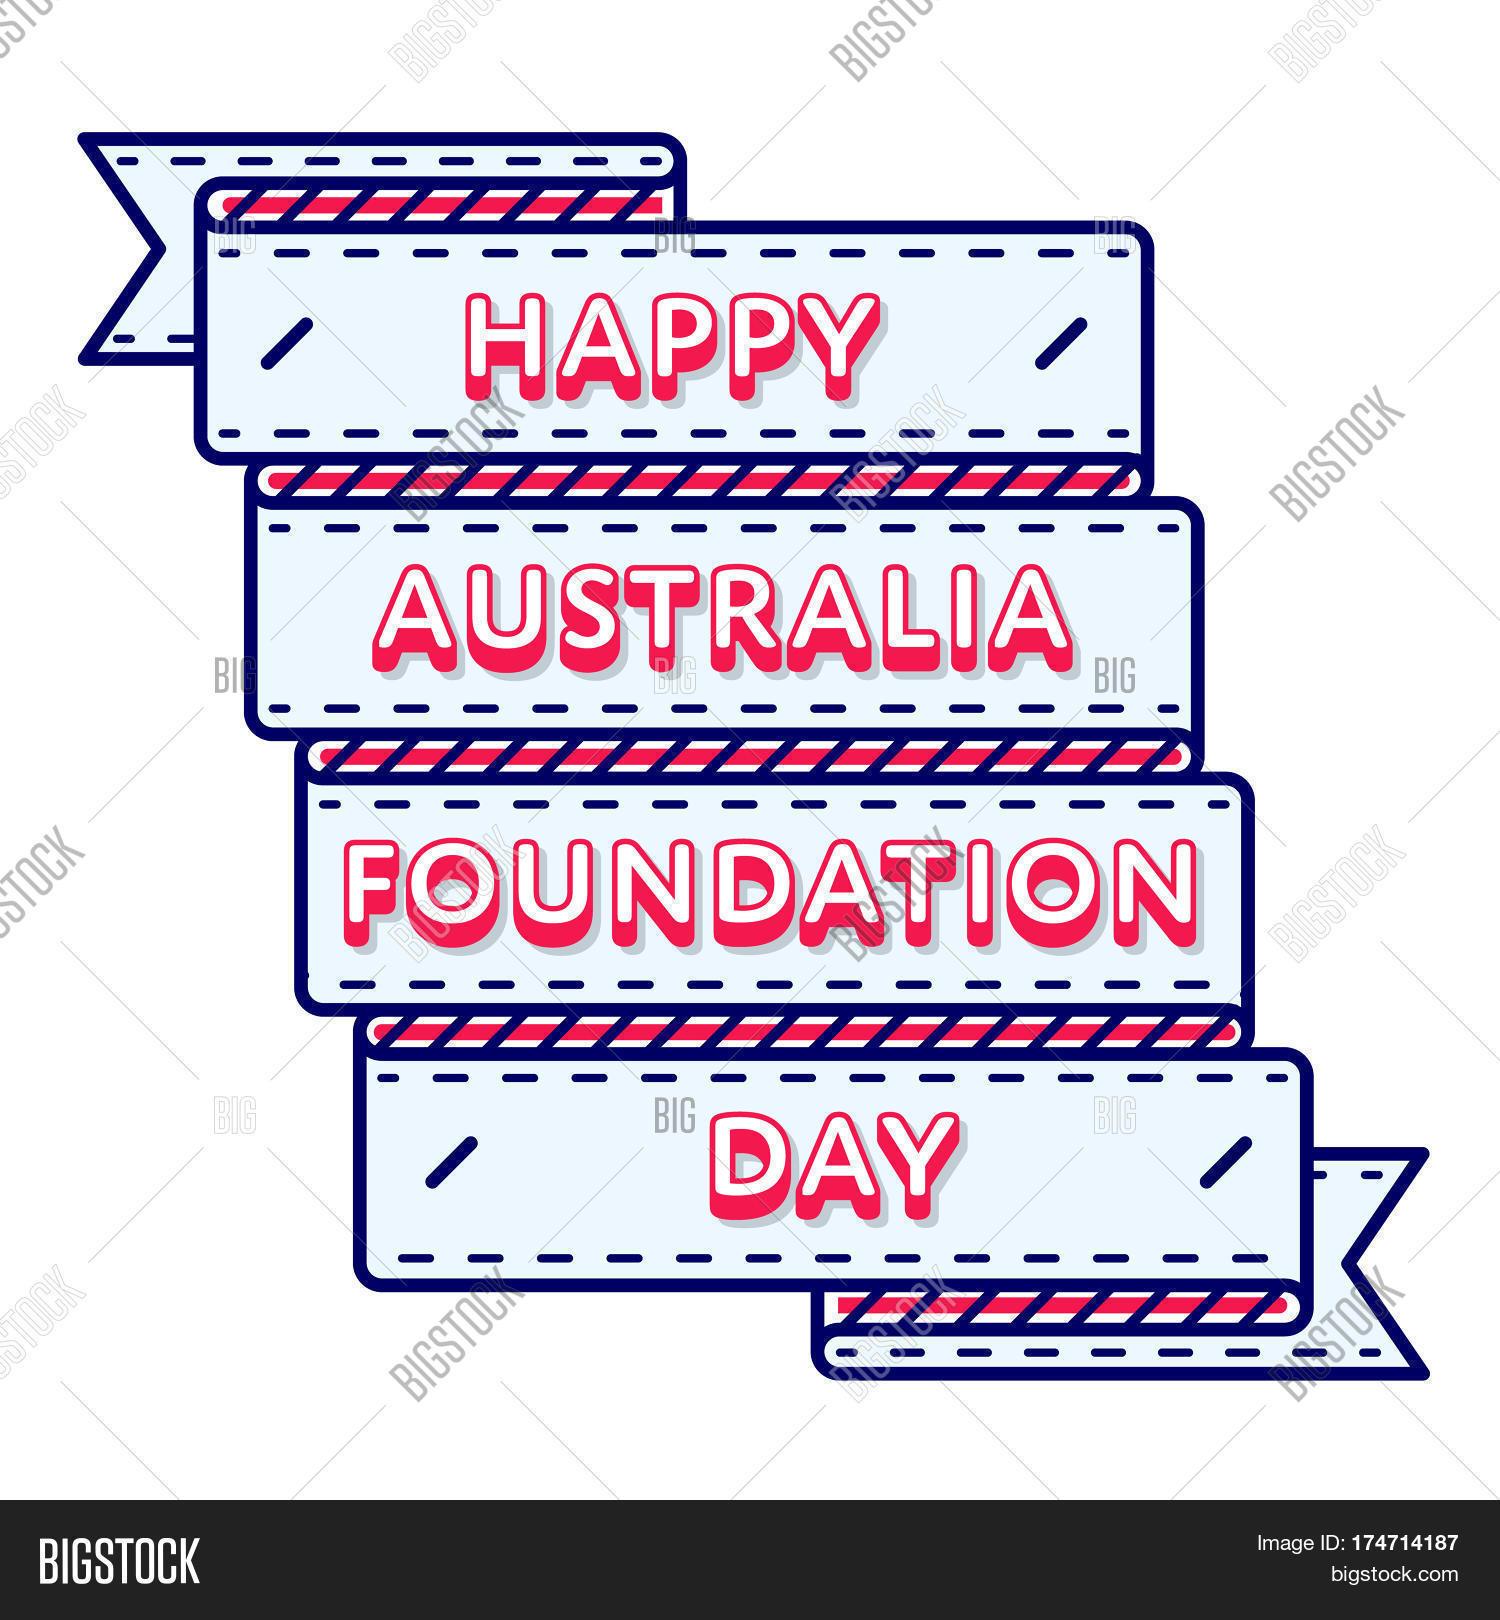 Australia Foundation Image Photo Free Trial Bigstock